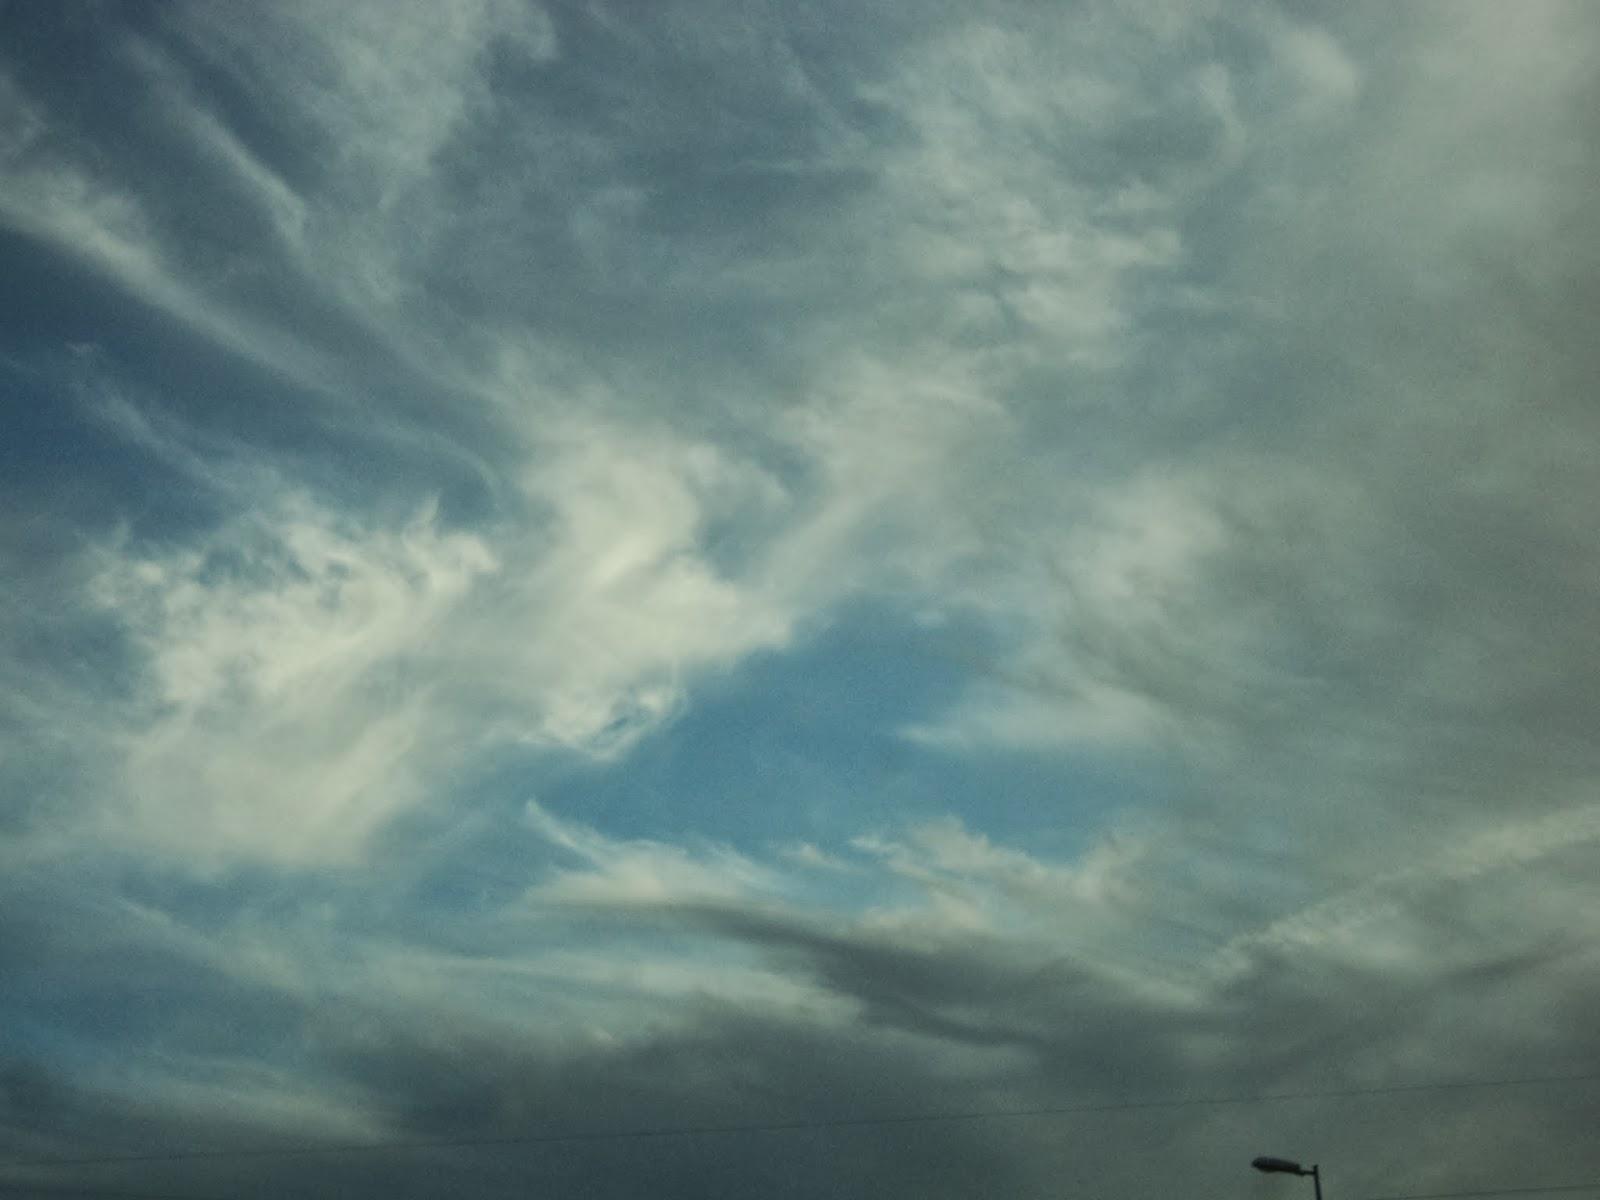 рисунок в небе